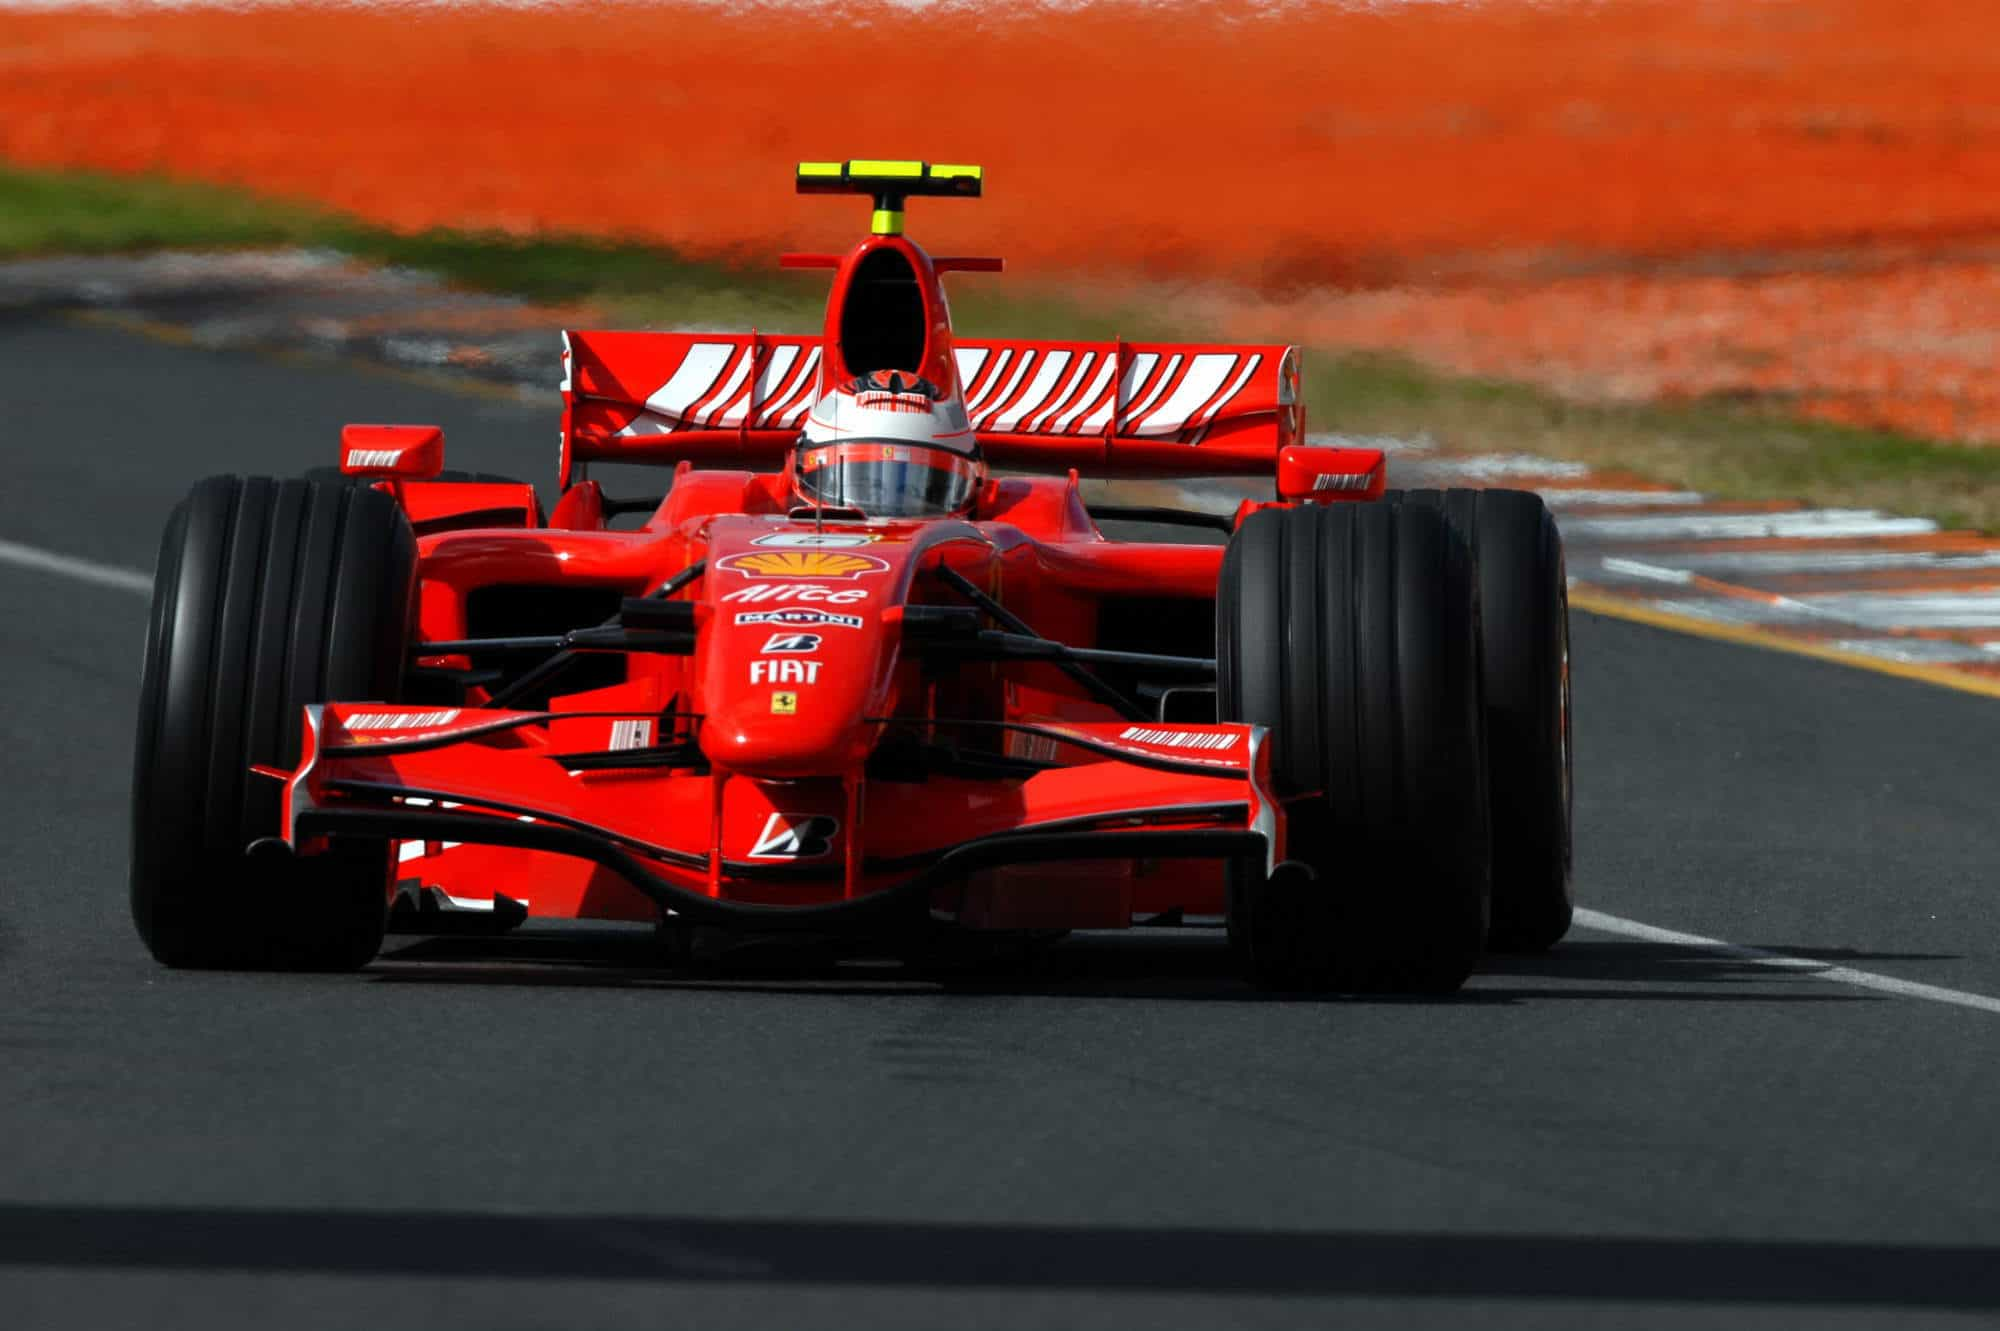 2007 Australian GP Kimi Raikkonen Ferrari F2007 Photo Ferrari